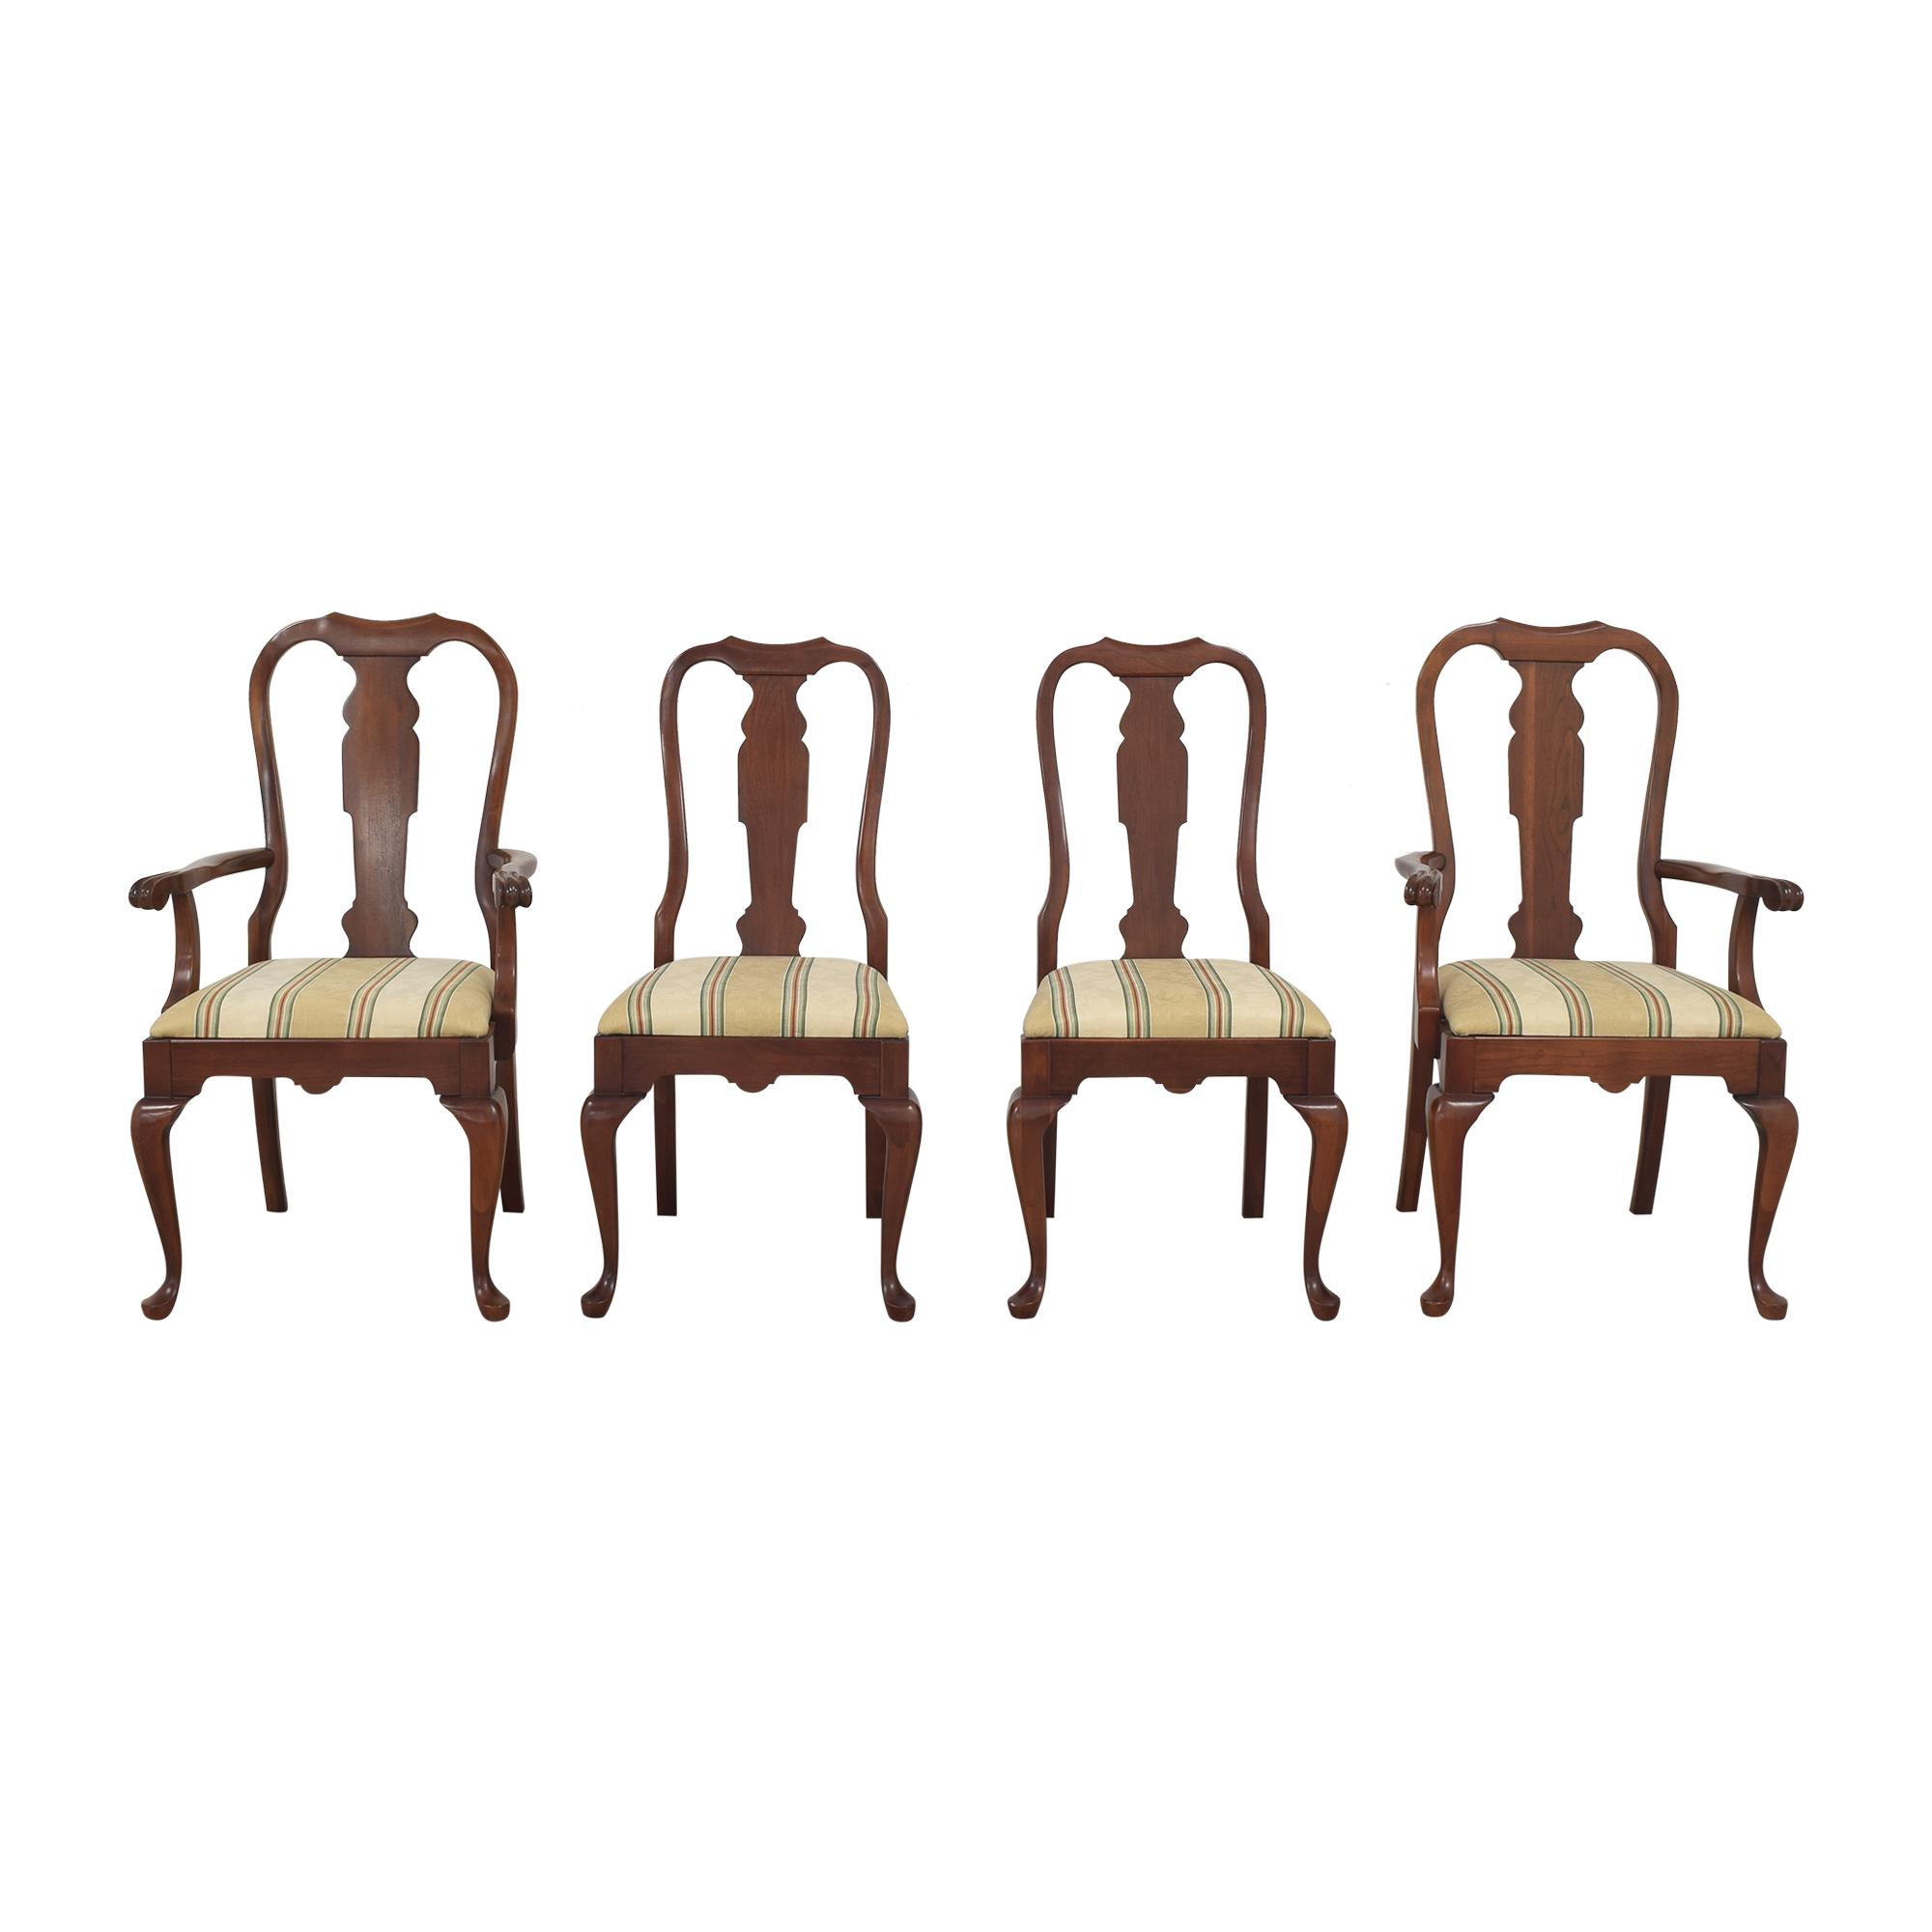 Pennsylvania House Pennsylvania House Stripe Dining Chairs discount